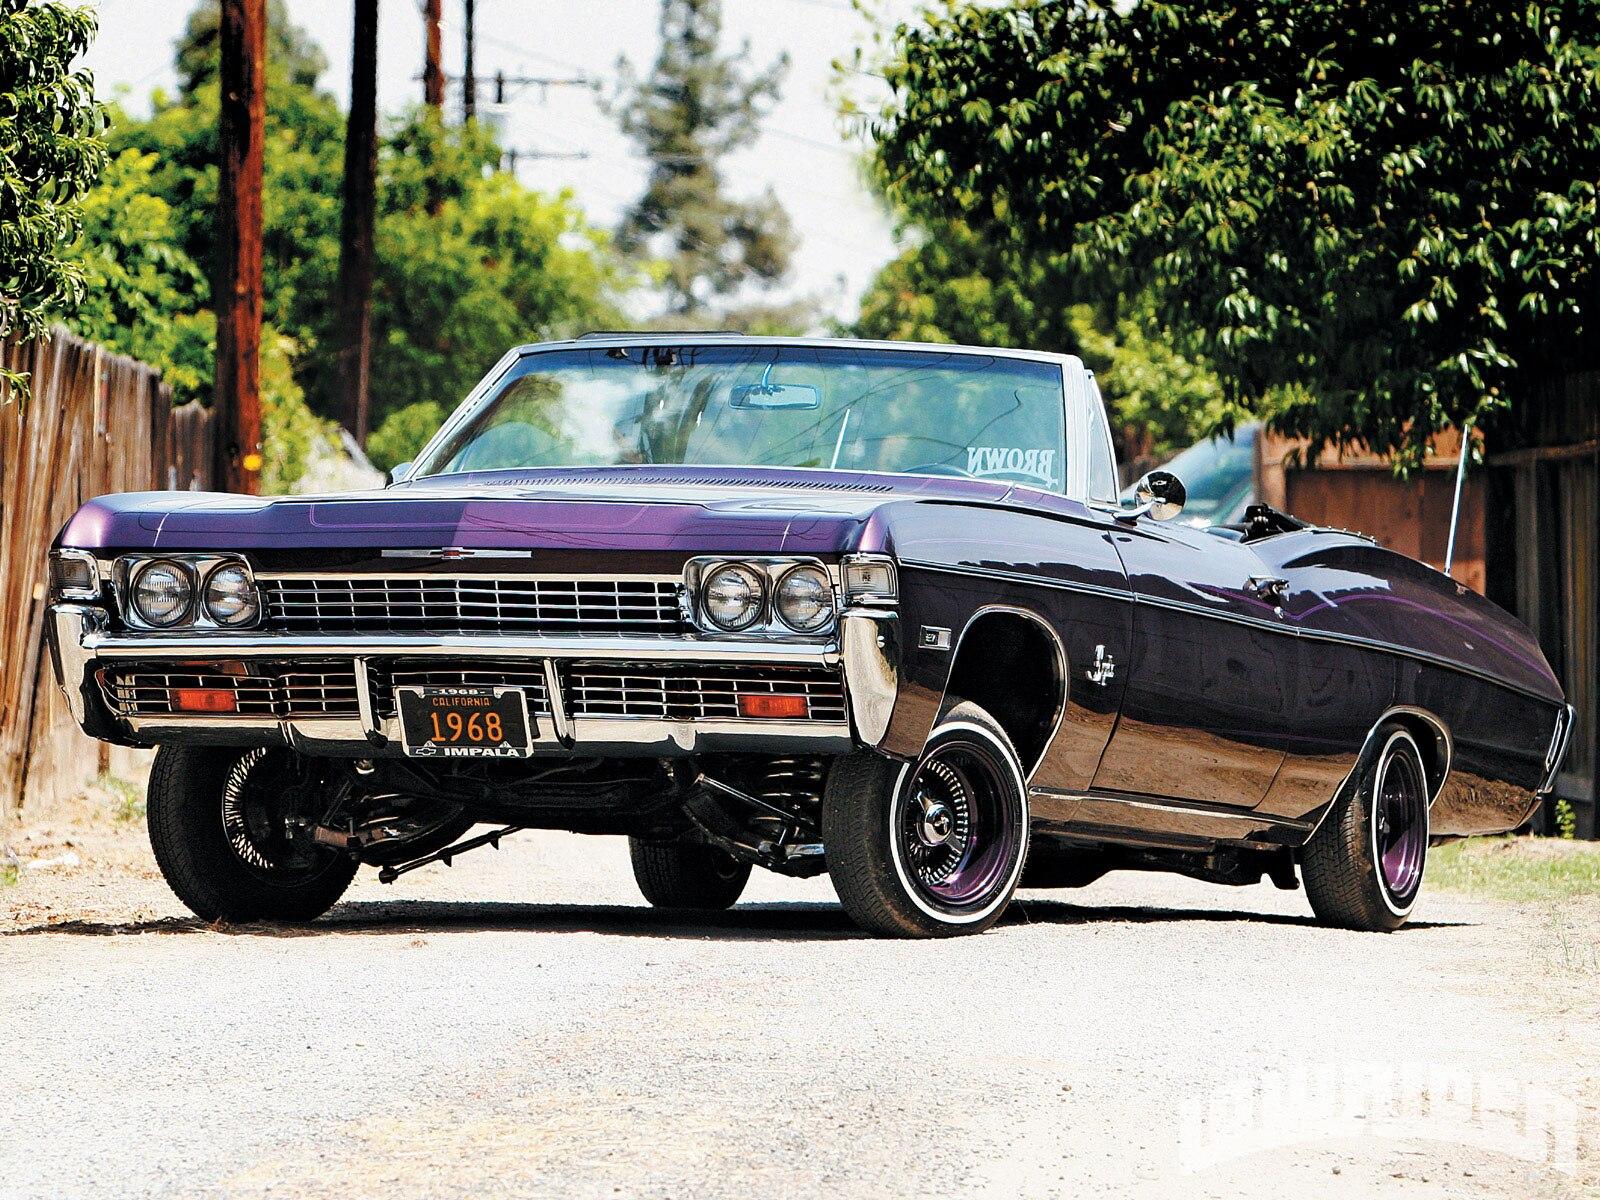 0812-lrmp-01-o-chevrolet-impala-convertible-plum-logo-front-fascia1